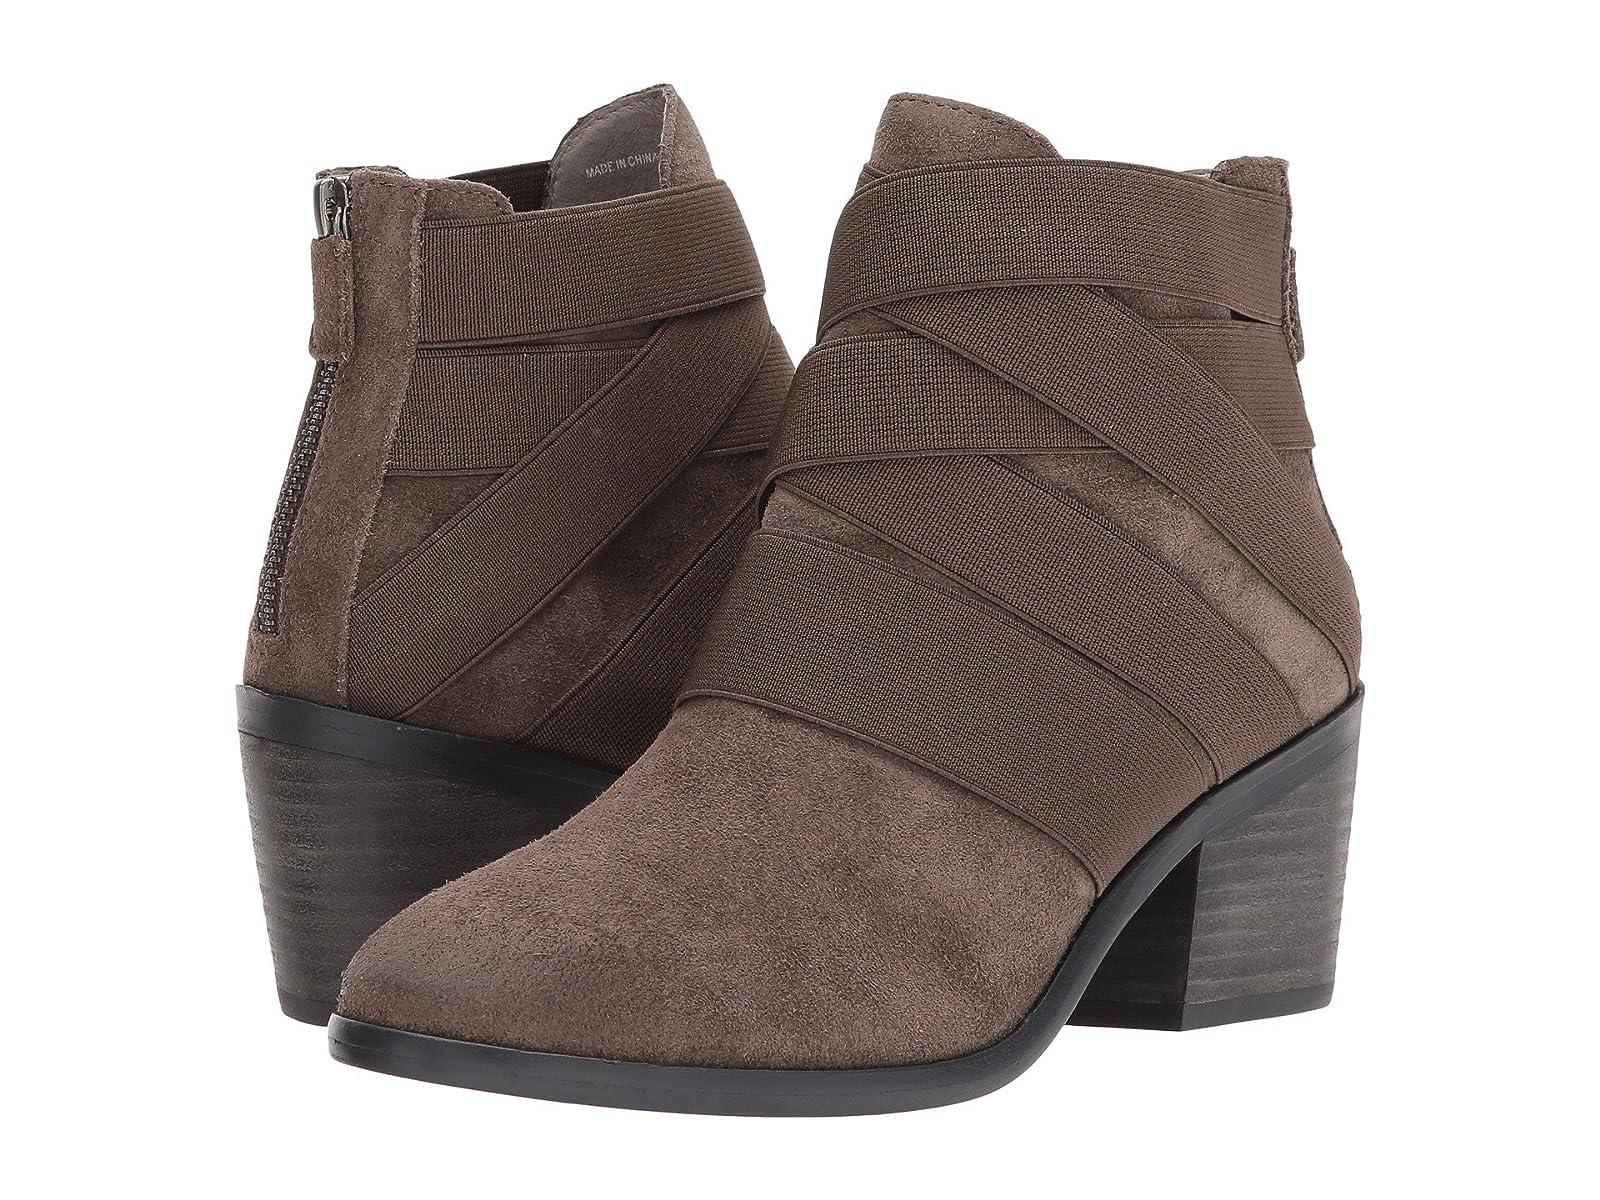 Eileen Fisher WillisCheap and distinctive eye-catching shoes